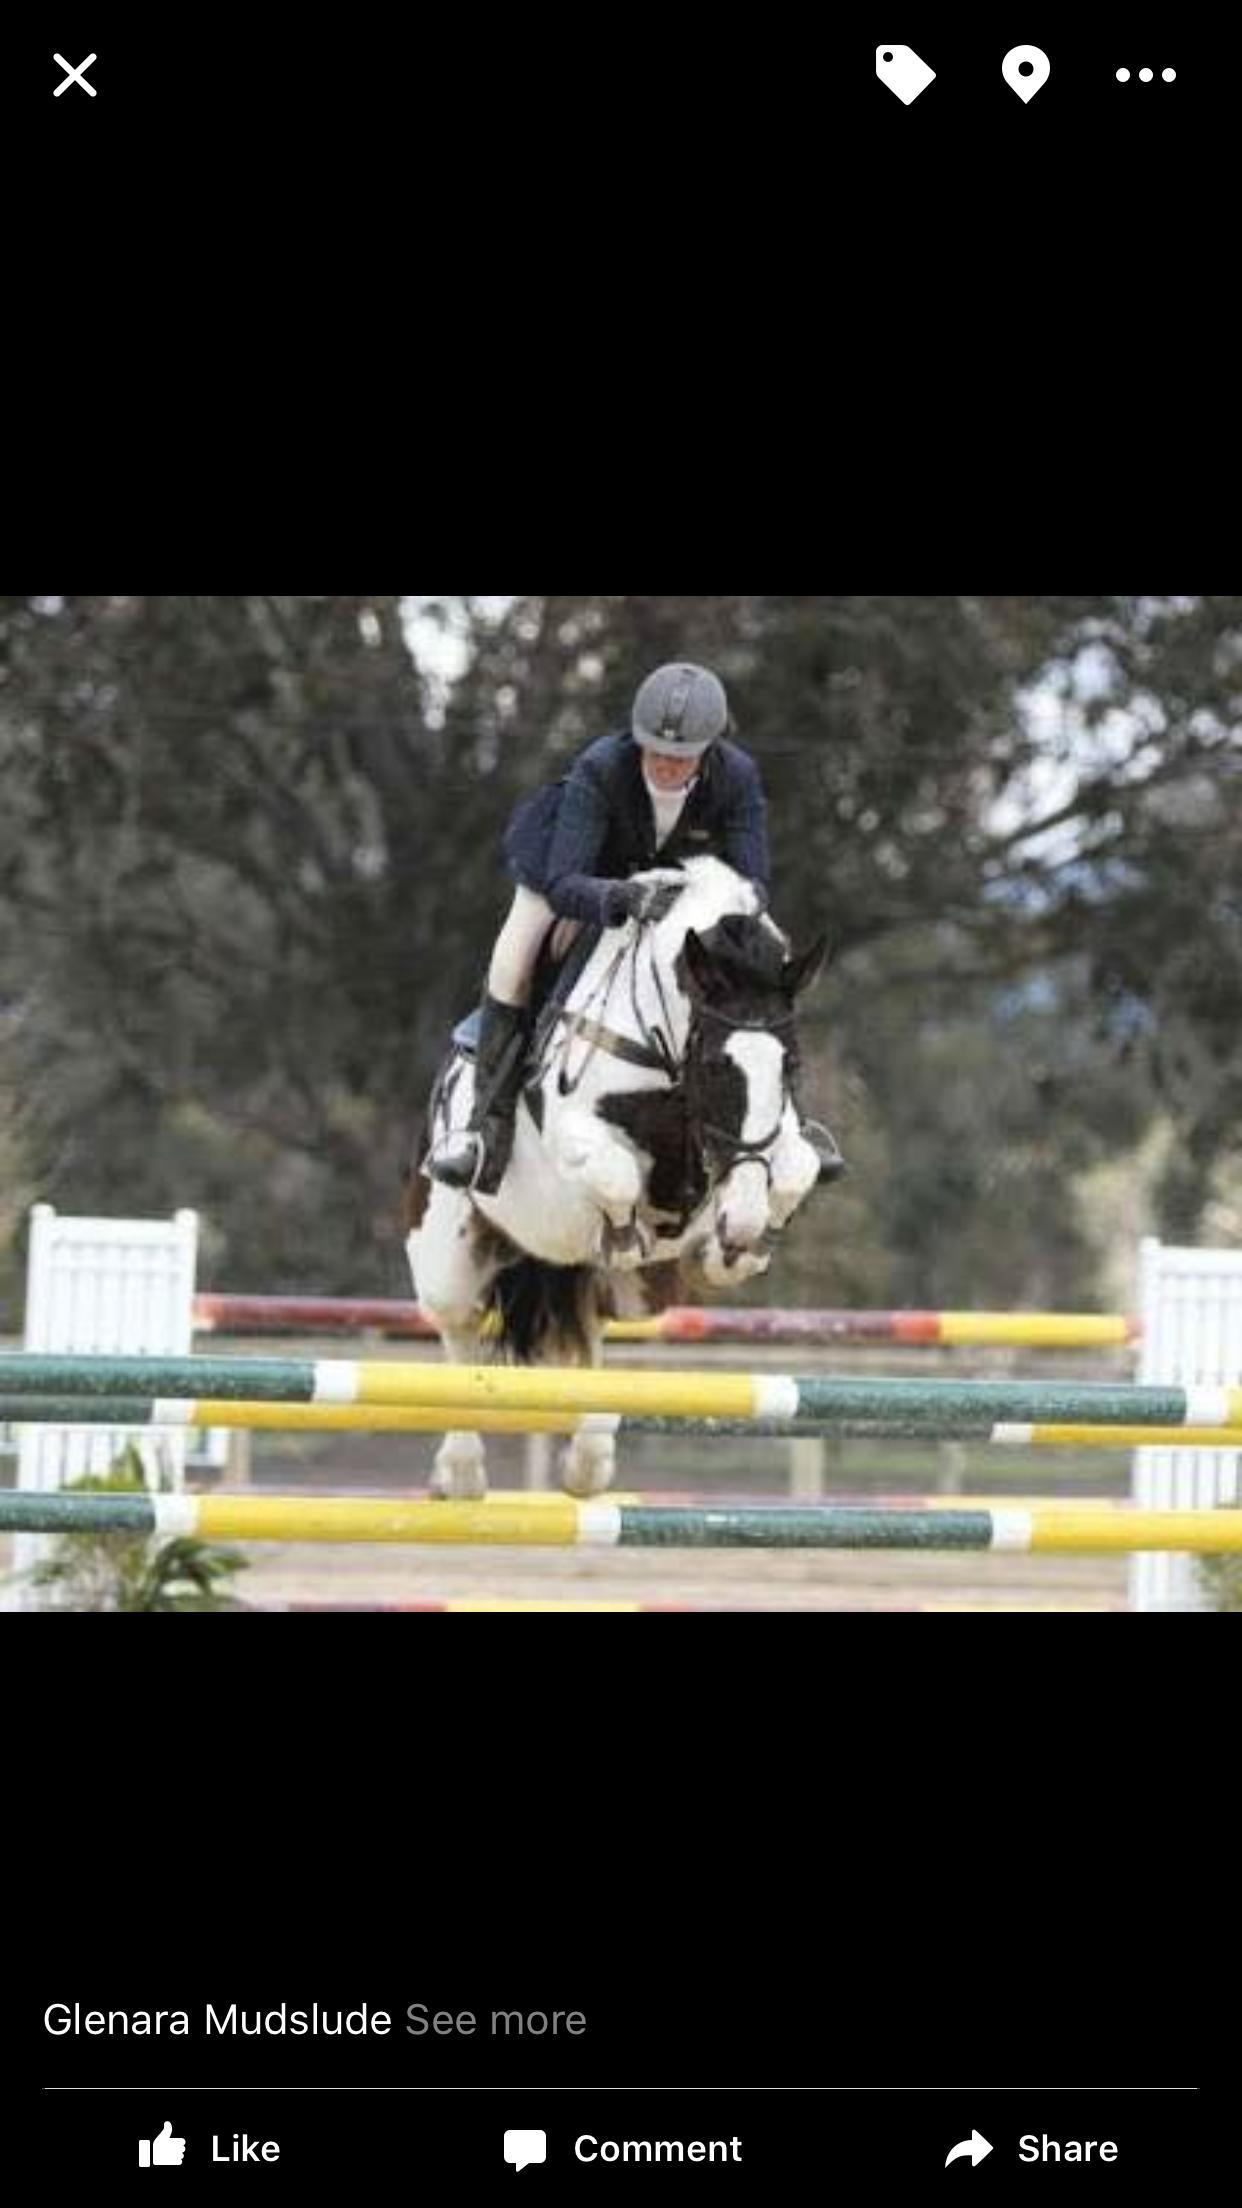 2016 pinto Warmblood gelding by Glenara Mudslide son !! Bred to jump!!